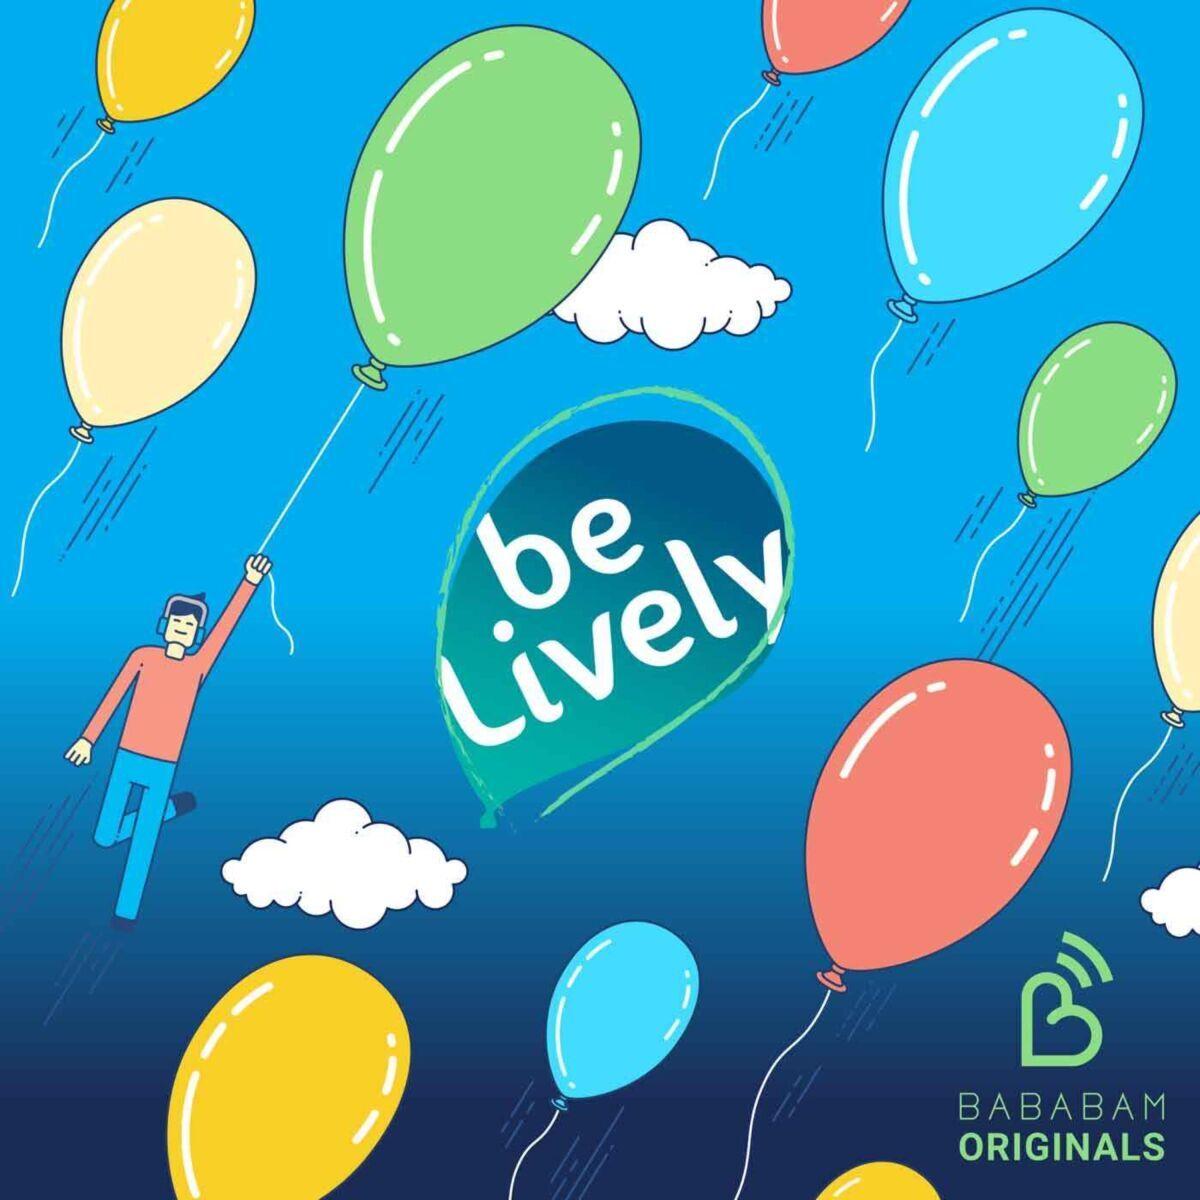 Be Lively, les exercices bien-être cover image